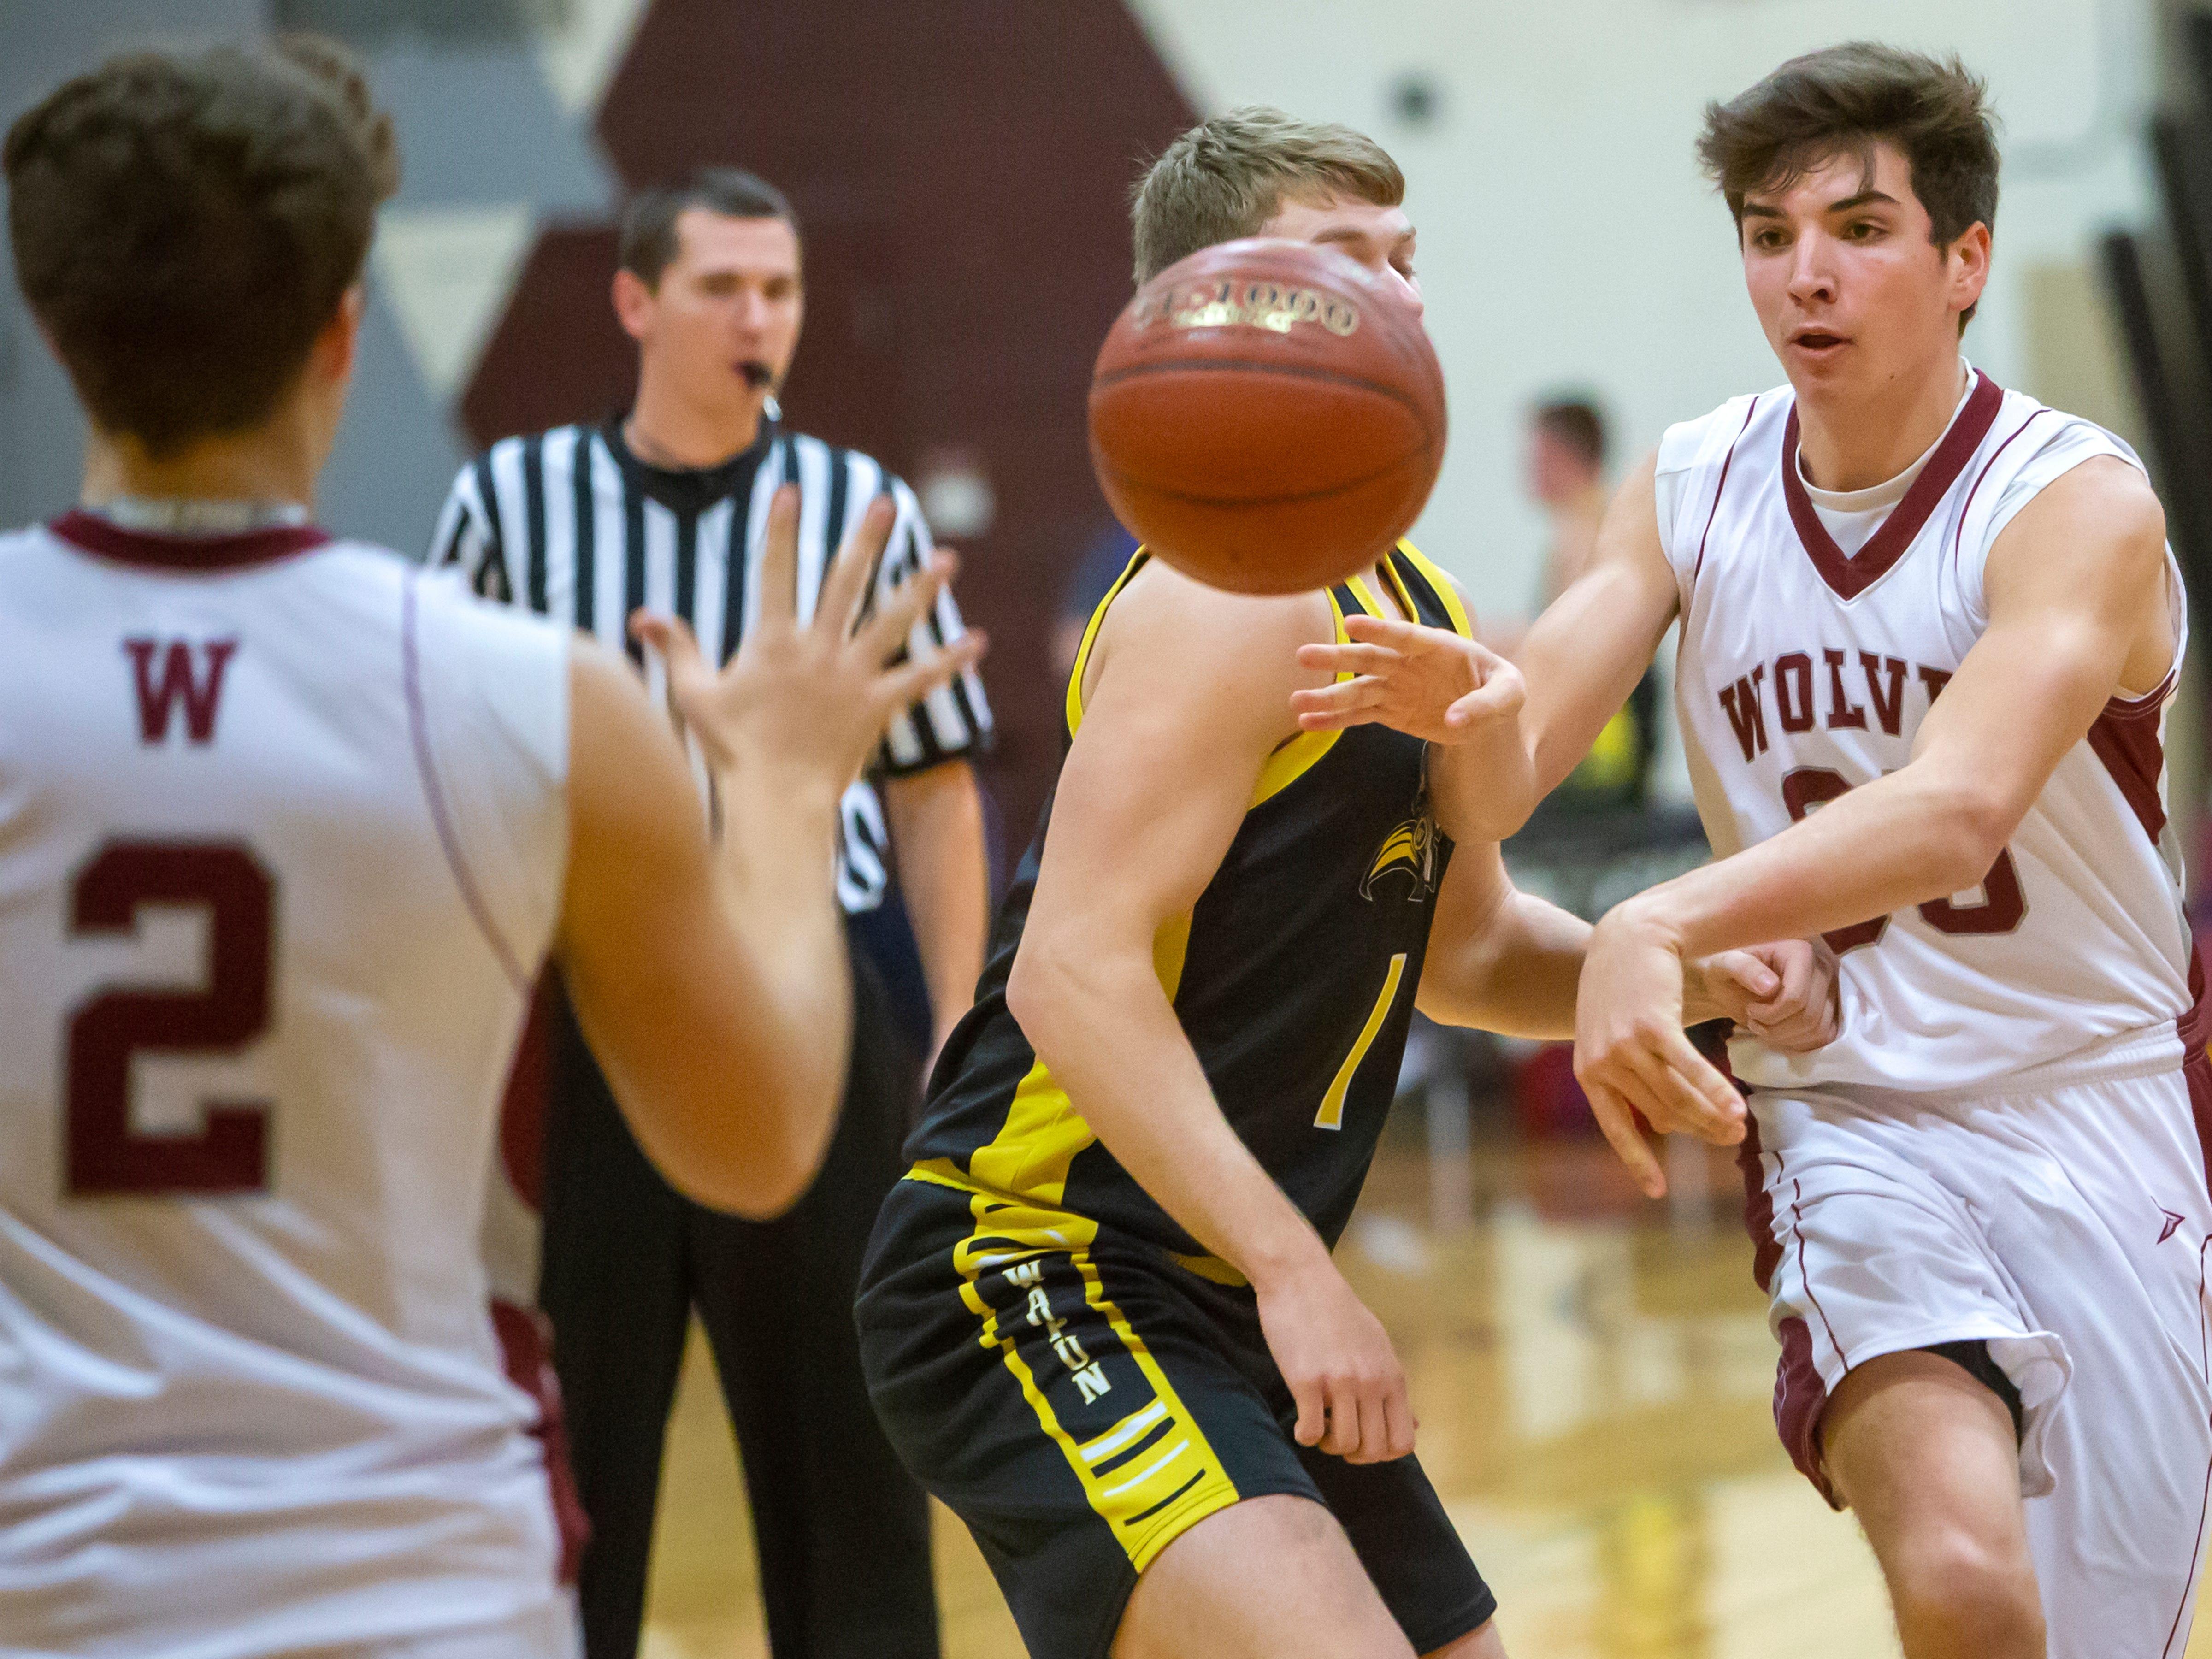 Winneconne's Greg Murawski throws a pass to Austin Hecker at Winneconne High School on Thursday, Dec. 20, 2018.